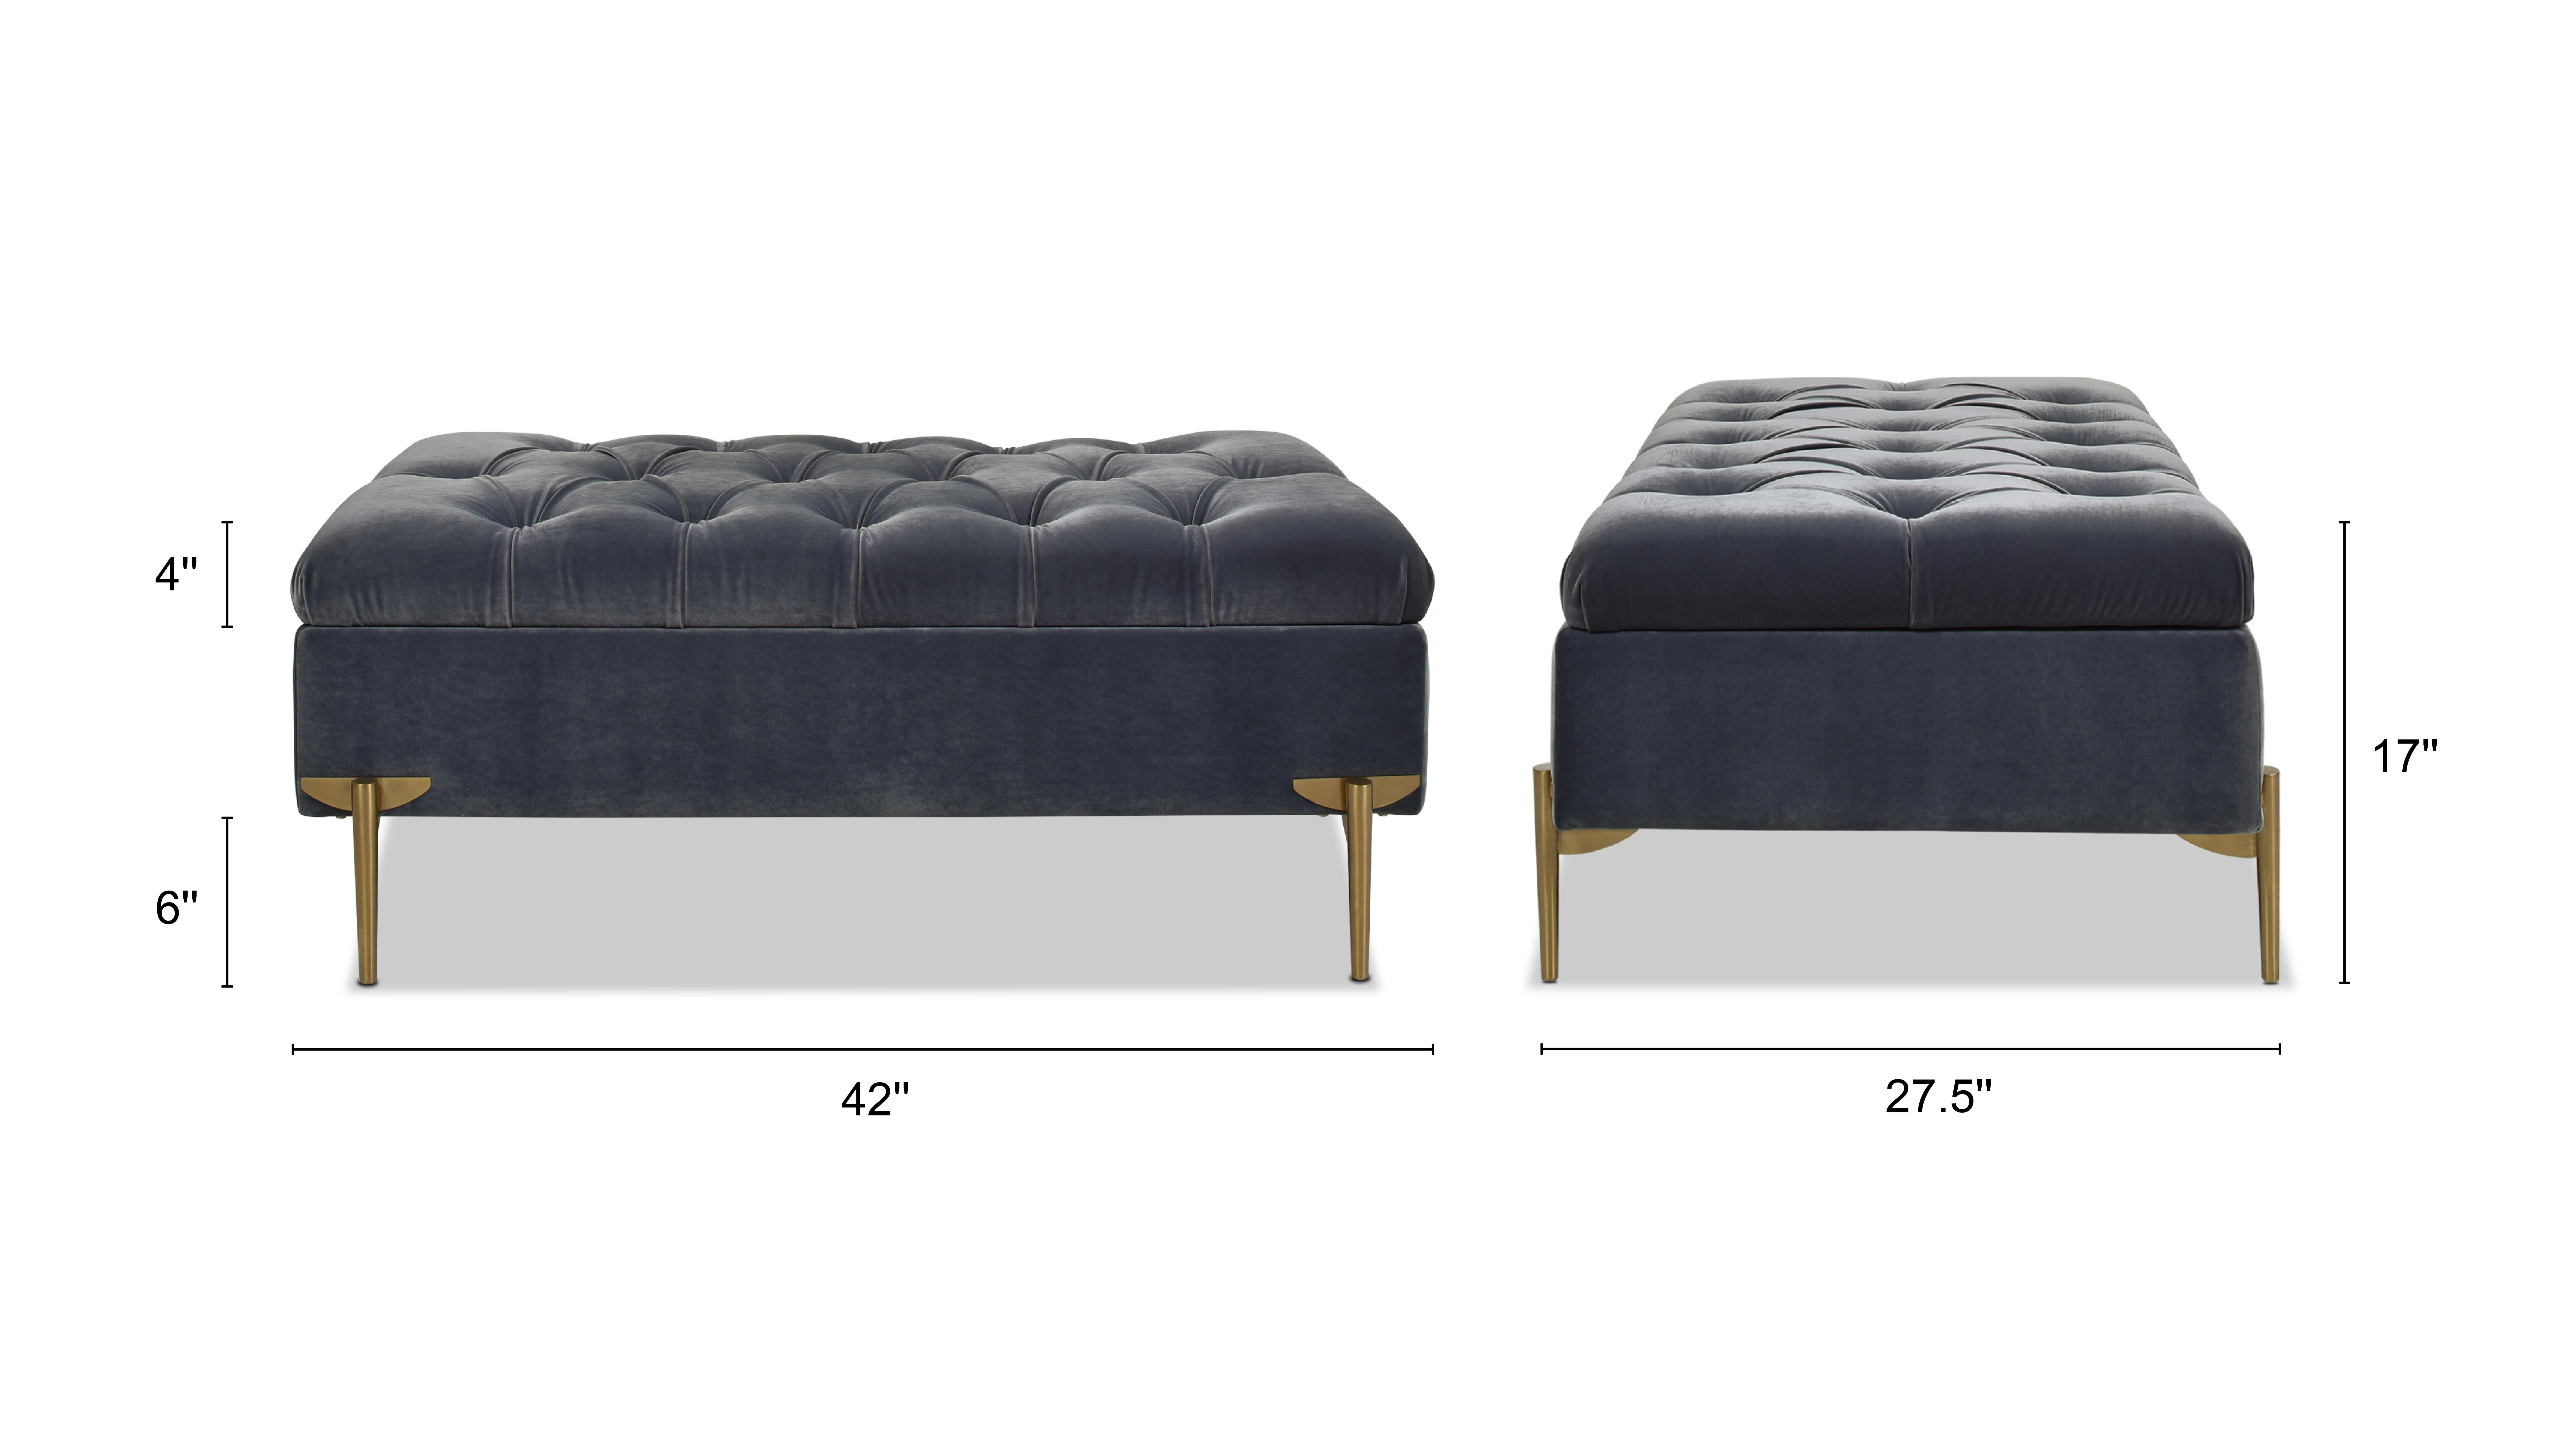 Estelle Upholstered Storage Bench Cocktail Ottoman